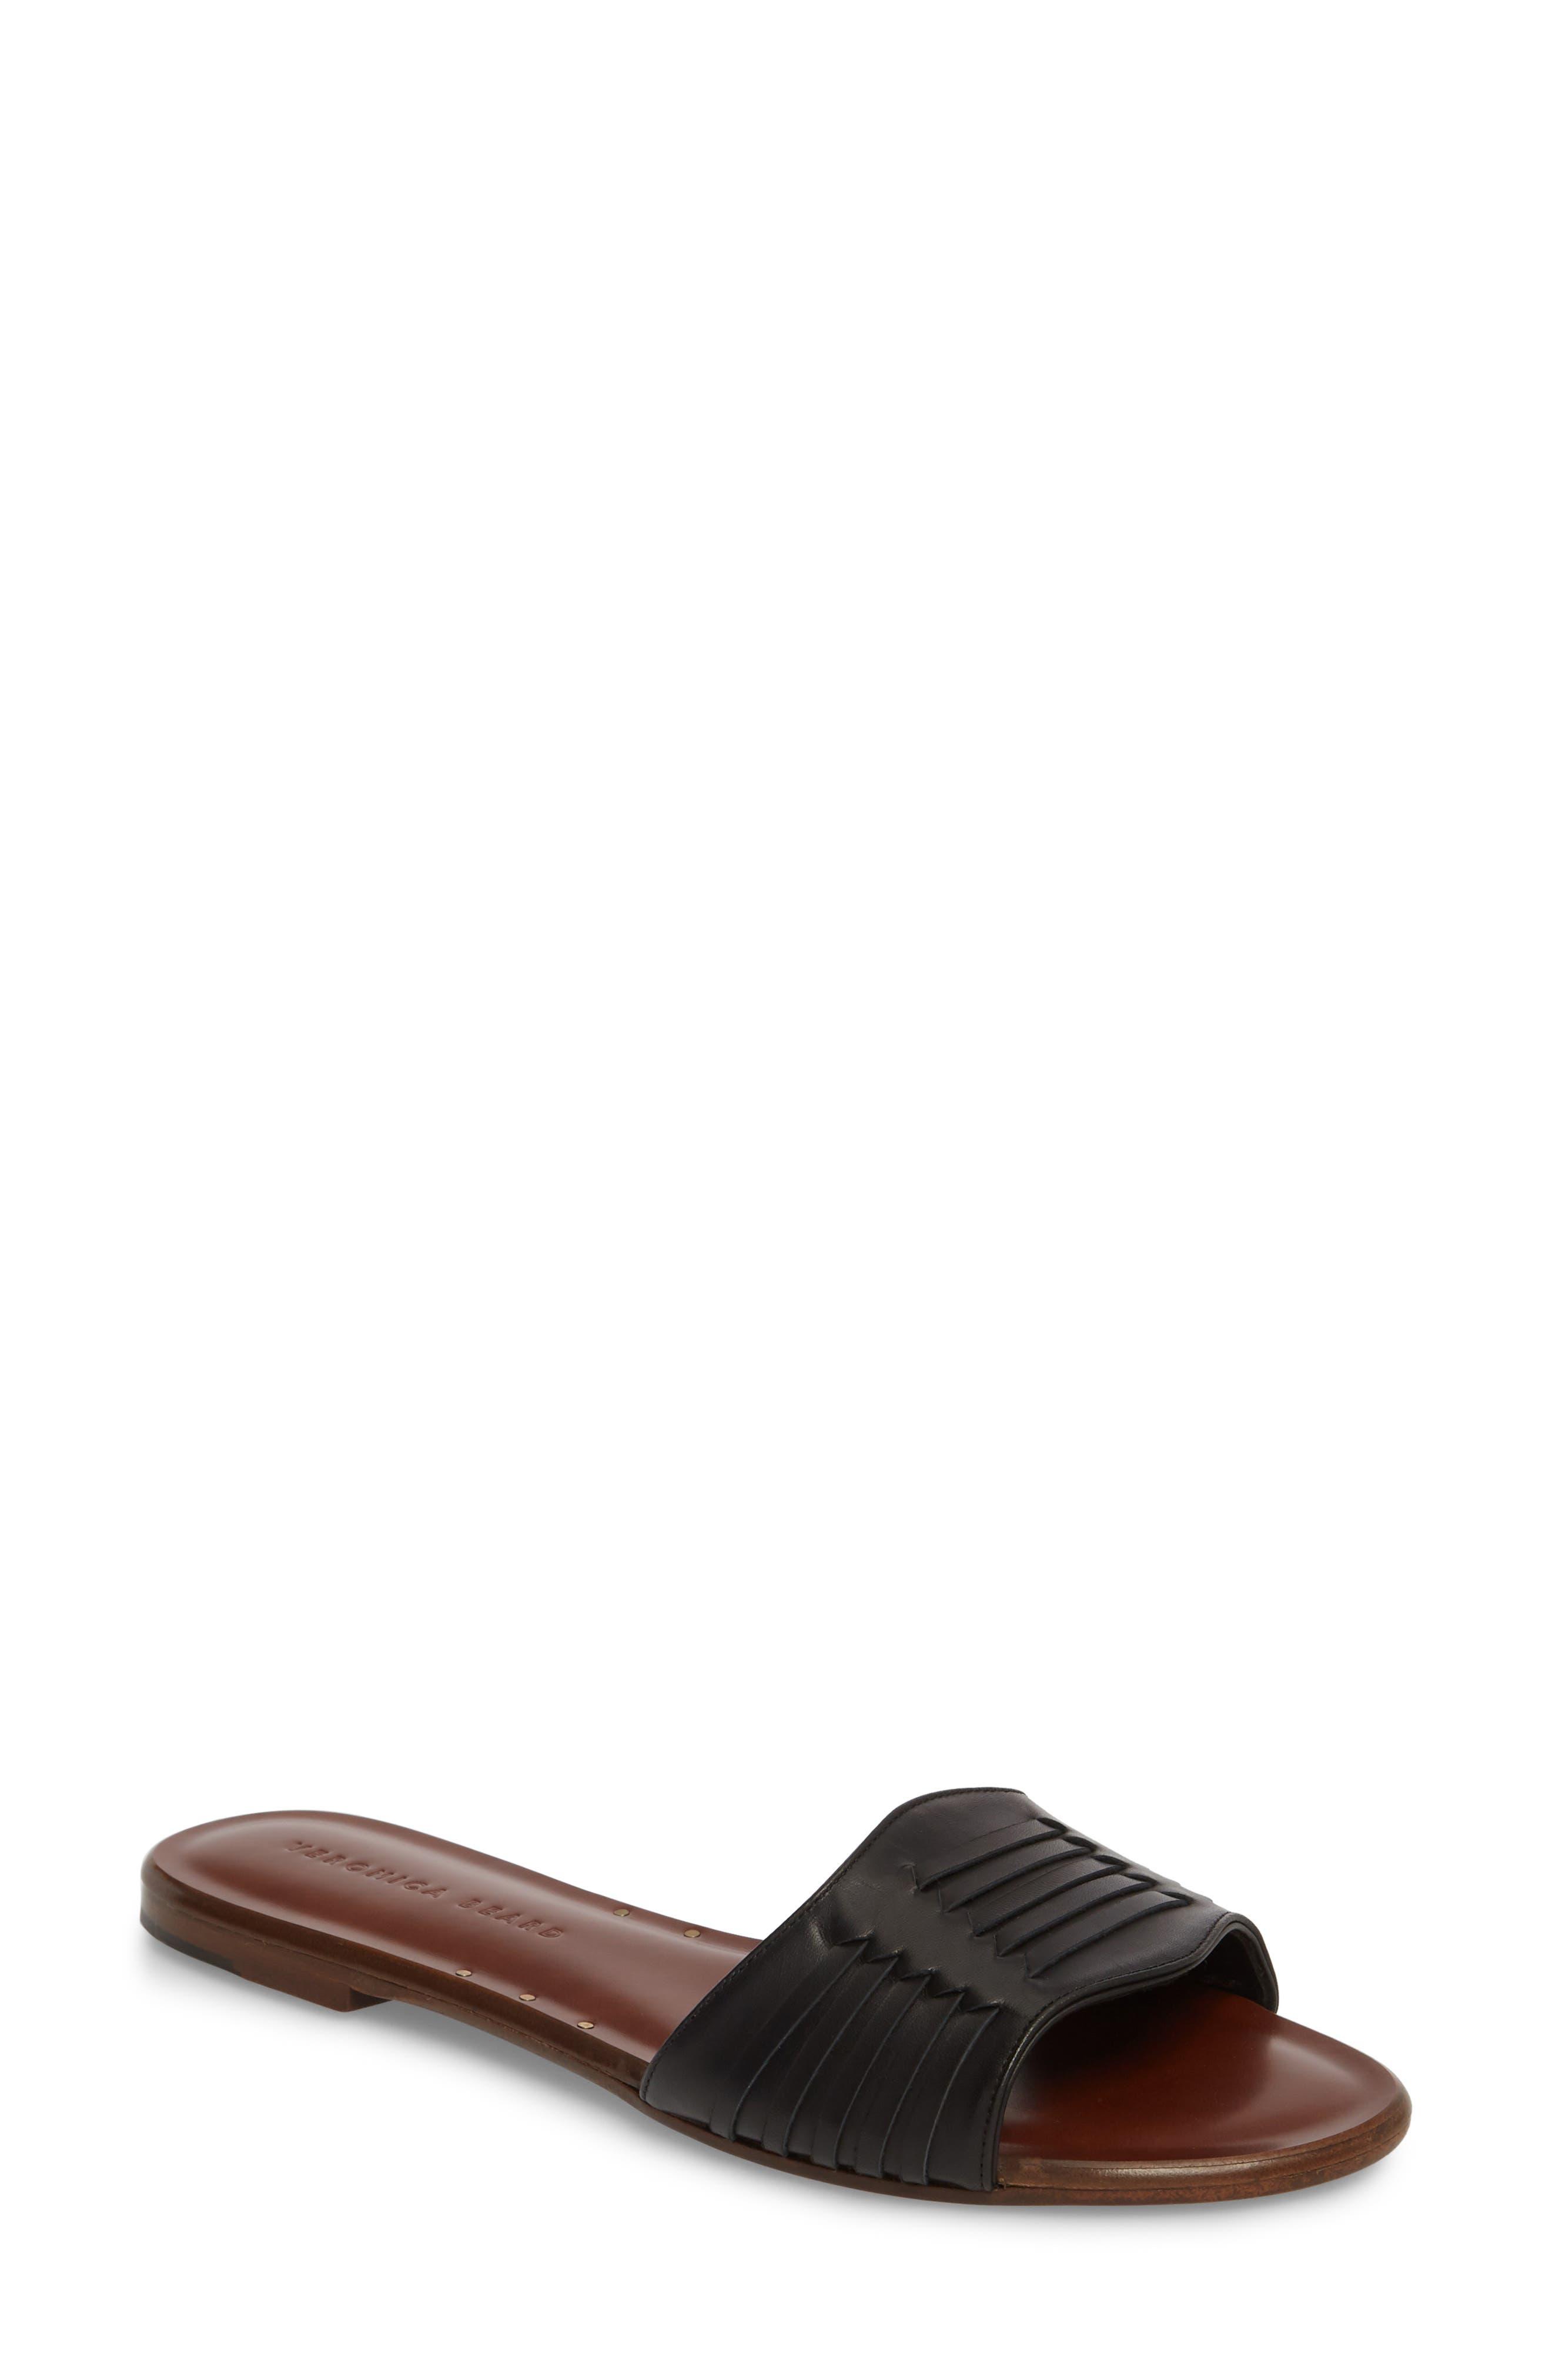 Faven Woven Slide Sandal,                         Main,                         color, 001